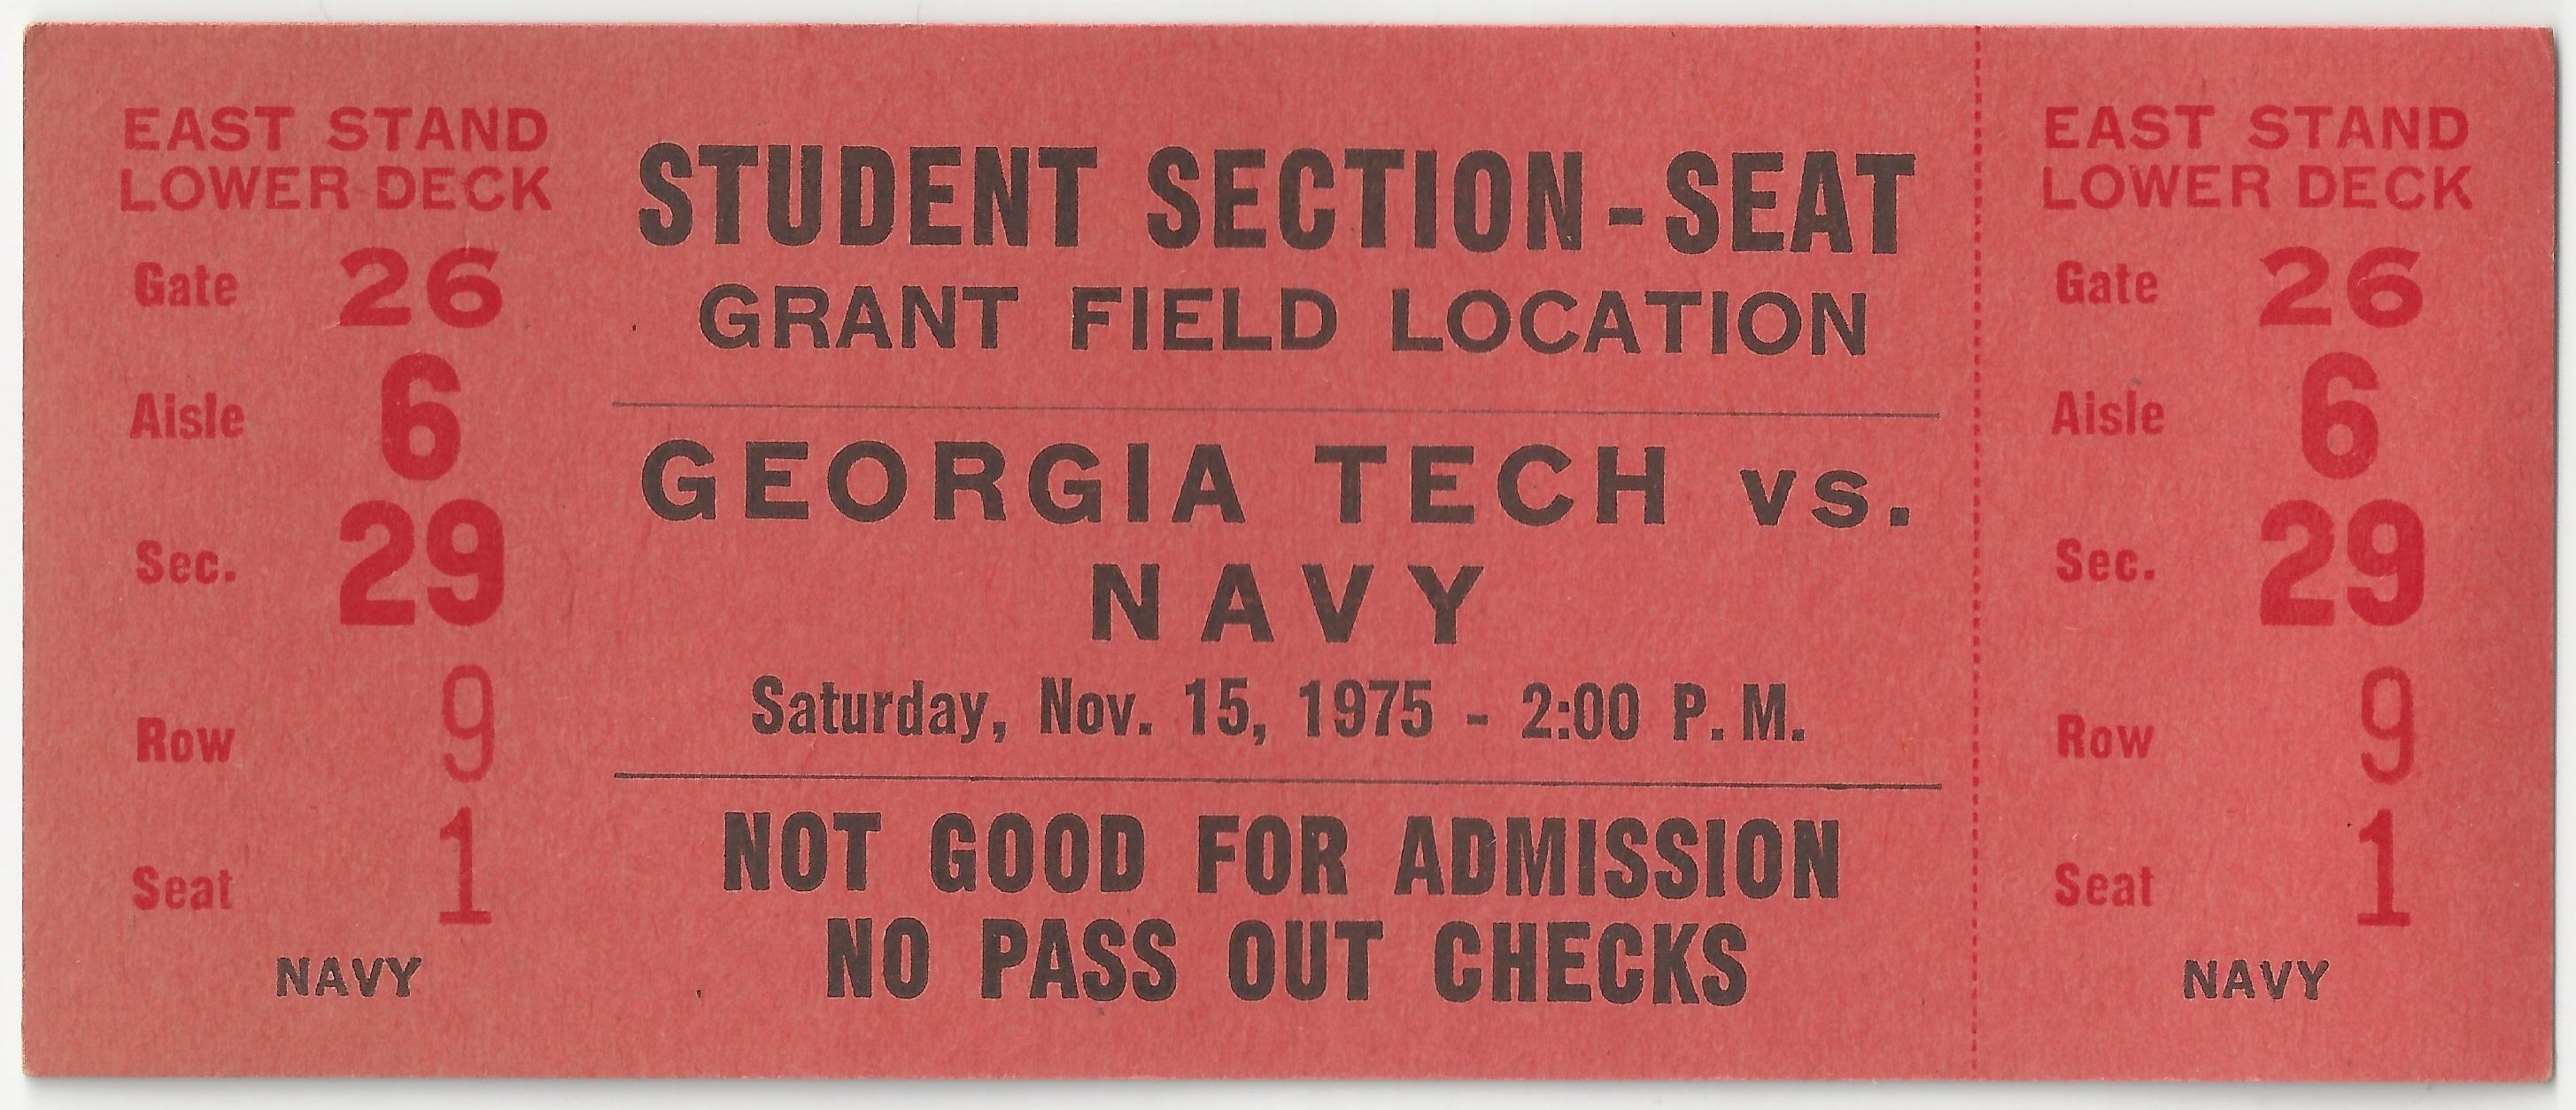 1975-11-15 - Georgia Tech vs. Navy - Student